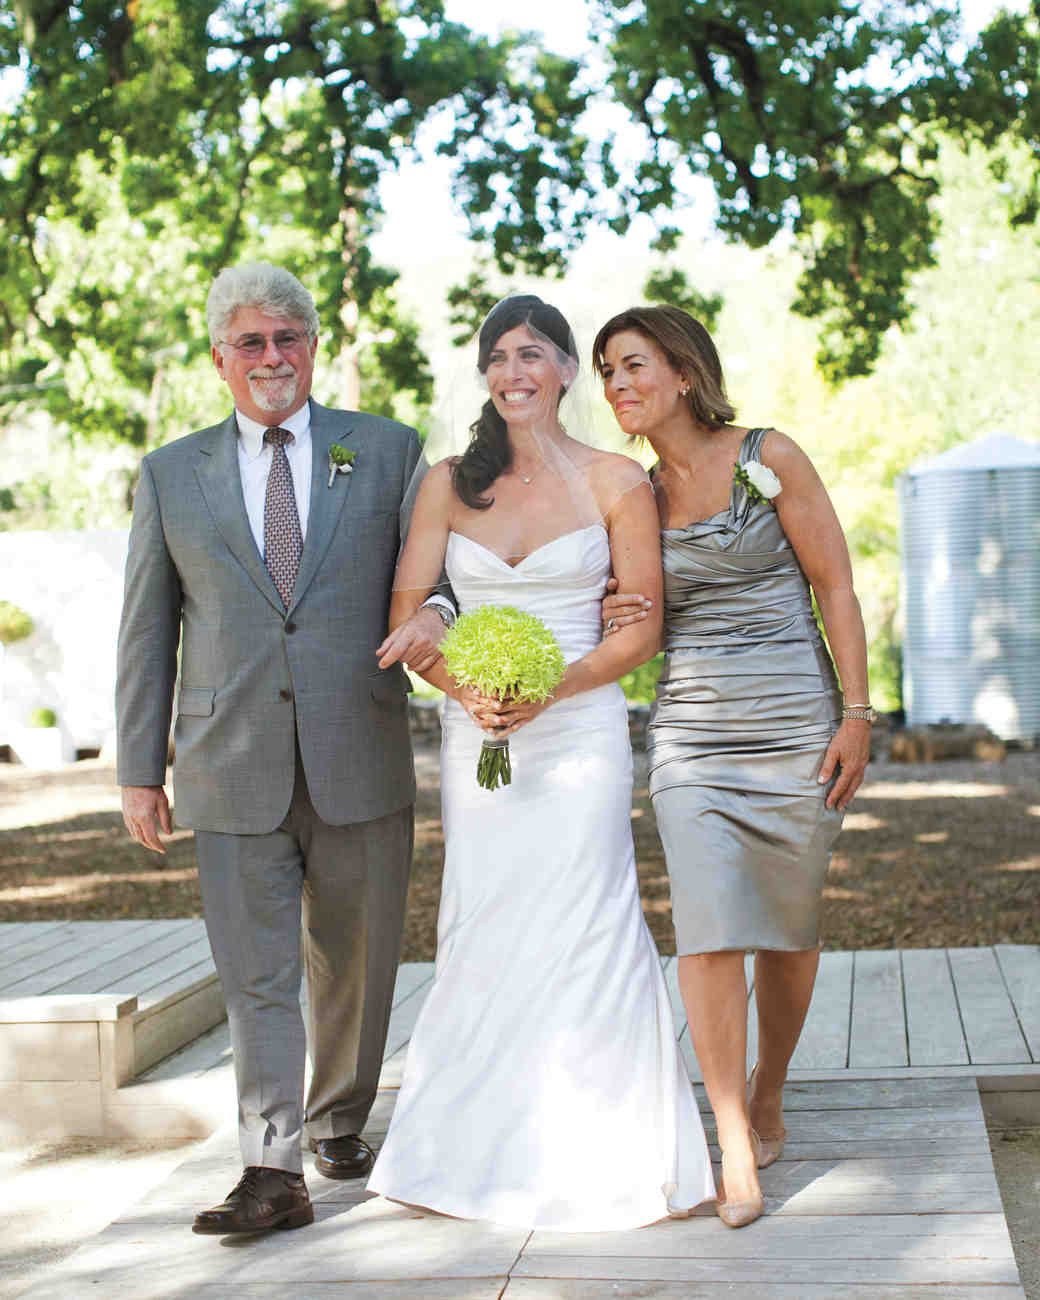 shoshana-jeremy-parents-0710-comp-mwds110421.jpg